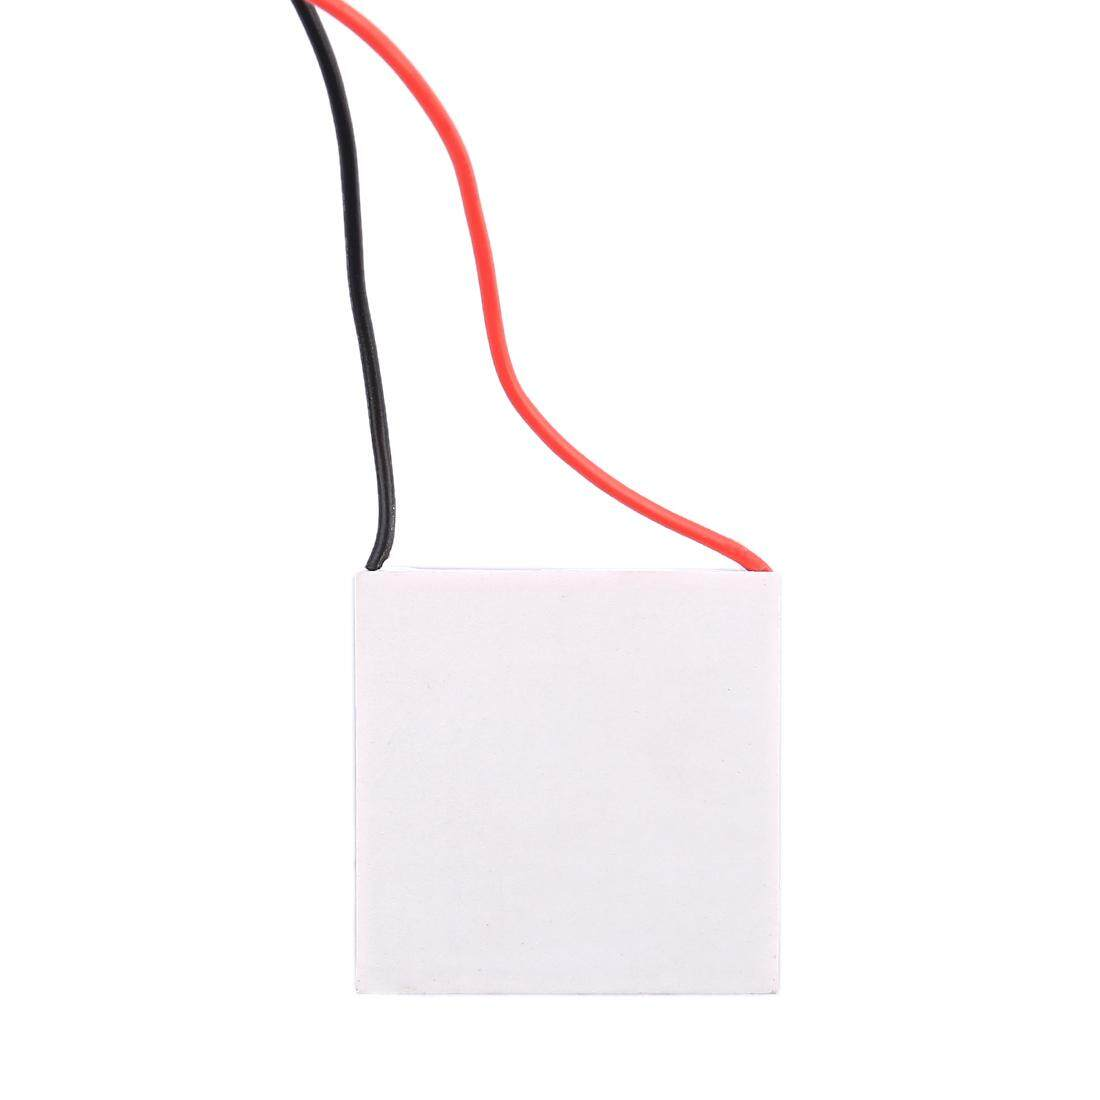 ... LT365 3 Pcs TEC1-12706 12 V 60 W 40X40 Mm Pendingin Termoelektrik Peltier Papan